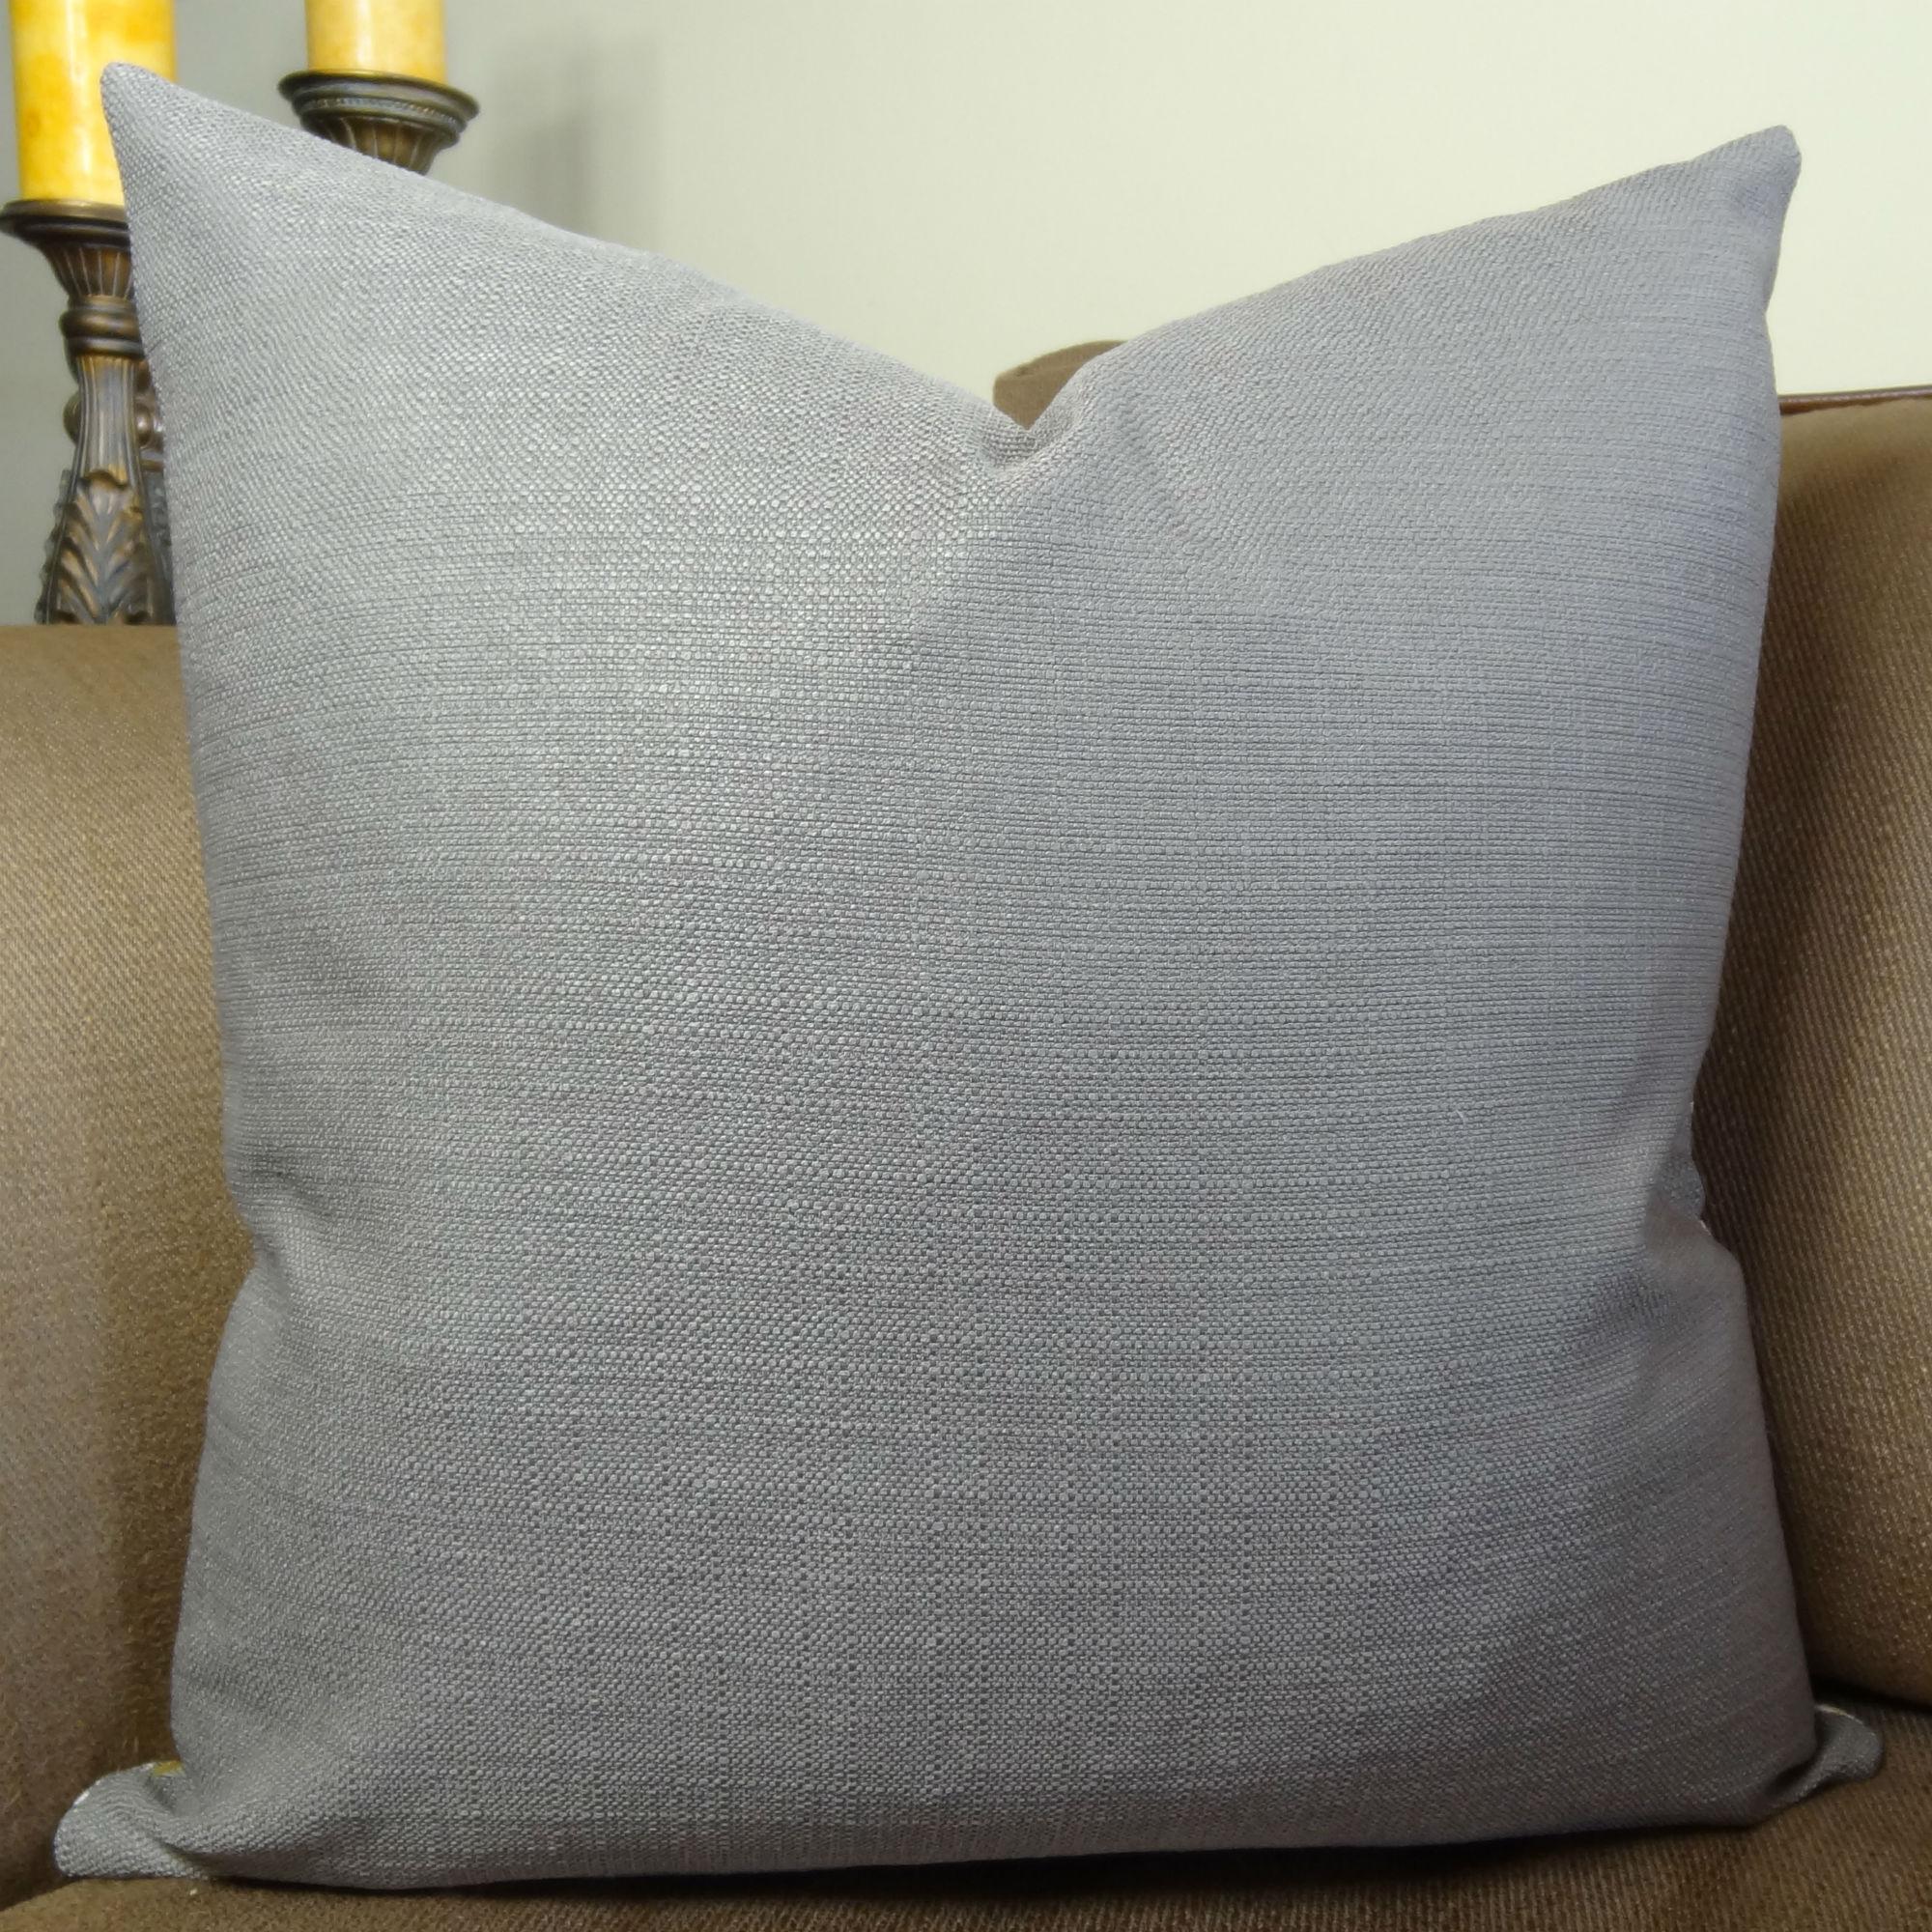 new white pillow set rectangle p botanical trellis bedding piped gray embroidered garden york from comforter pillows